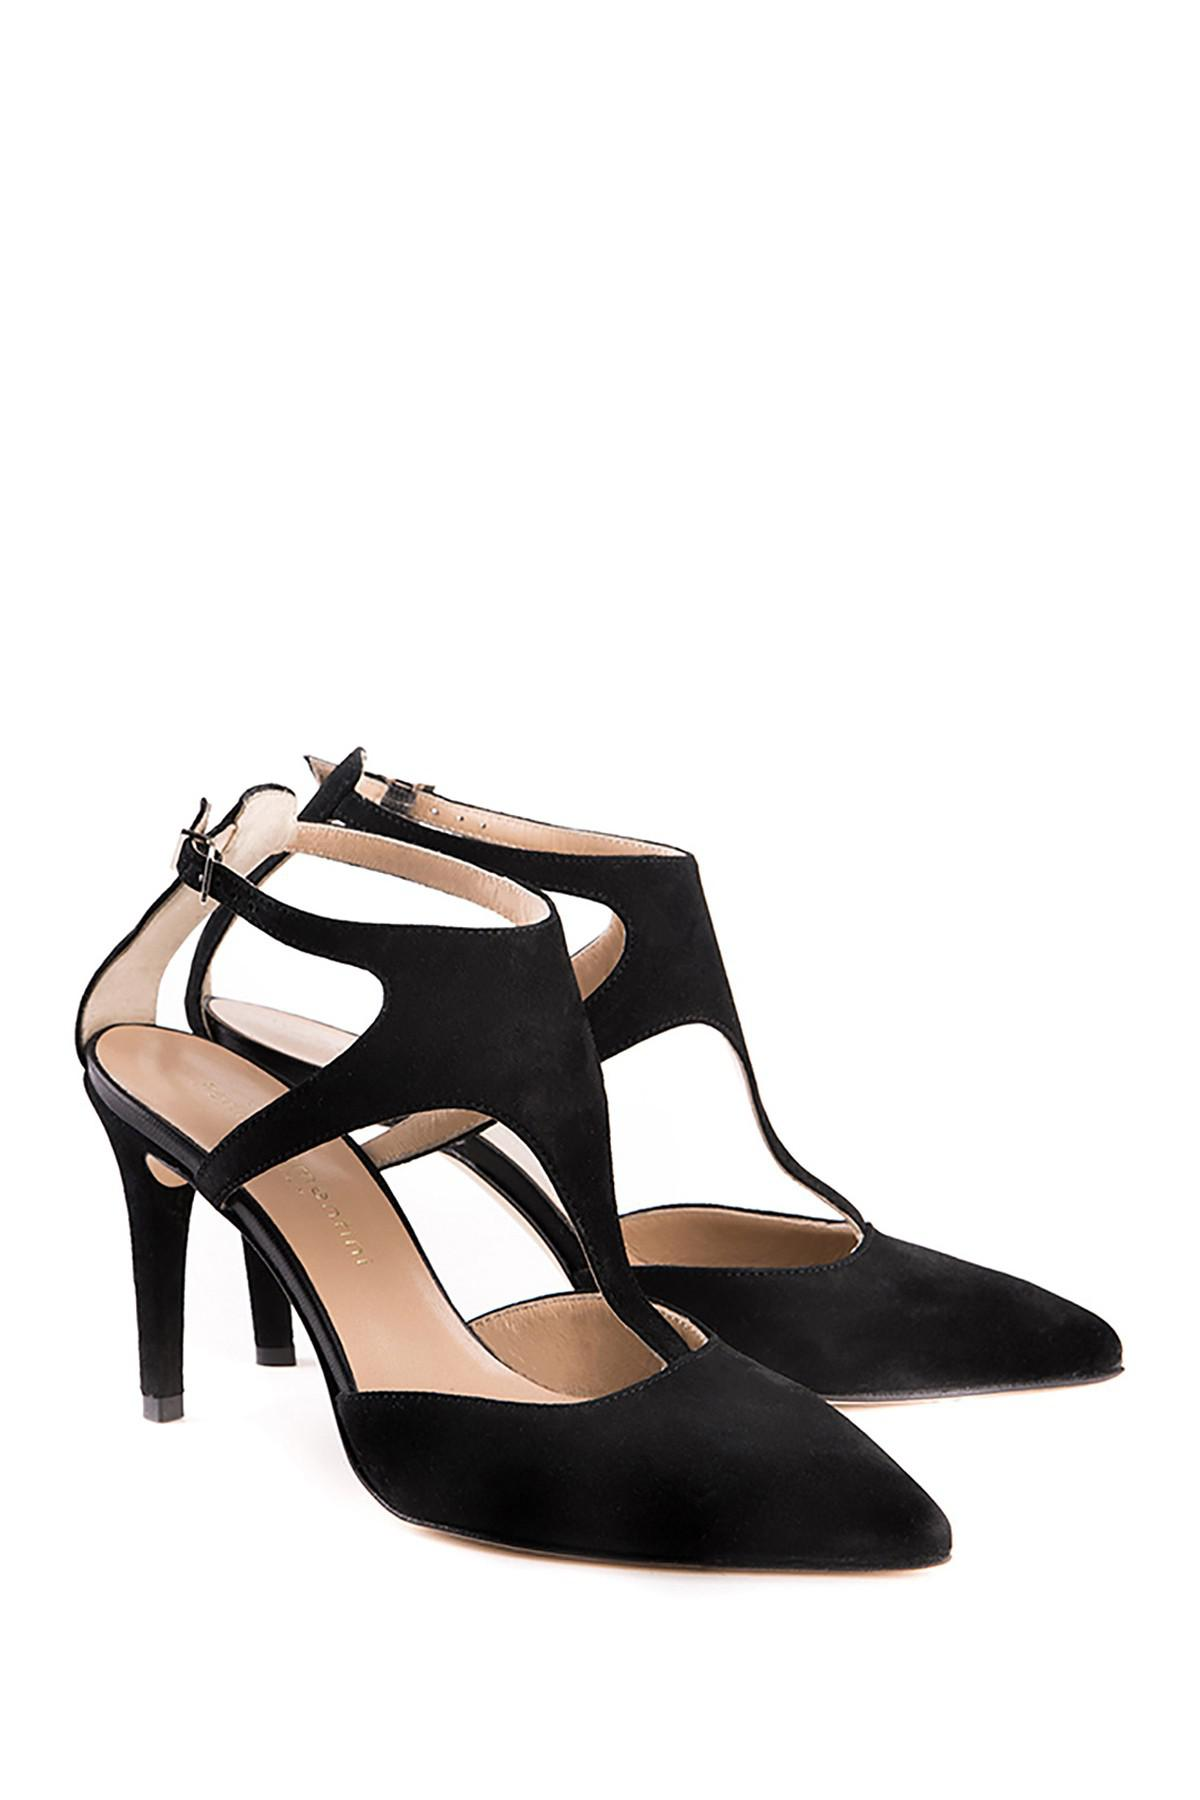 Perla Formentini Sofia Leather Ankle Strap Pump NnrTklT0